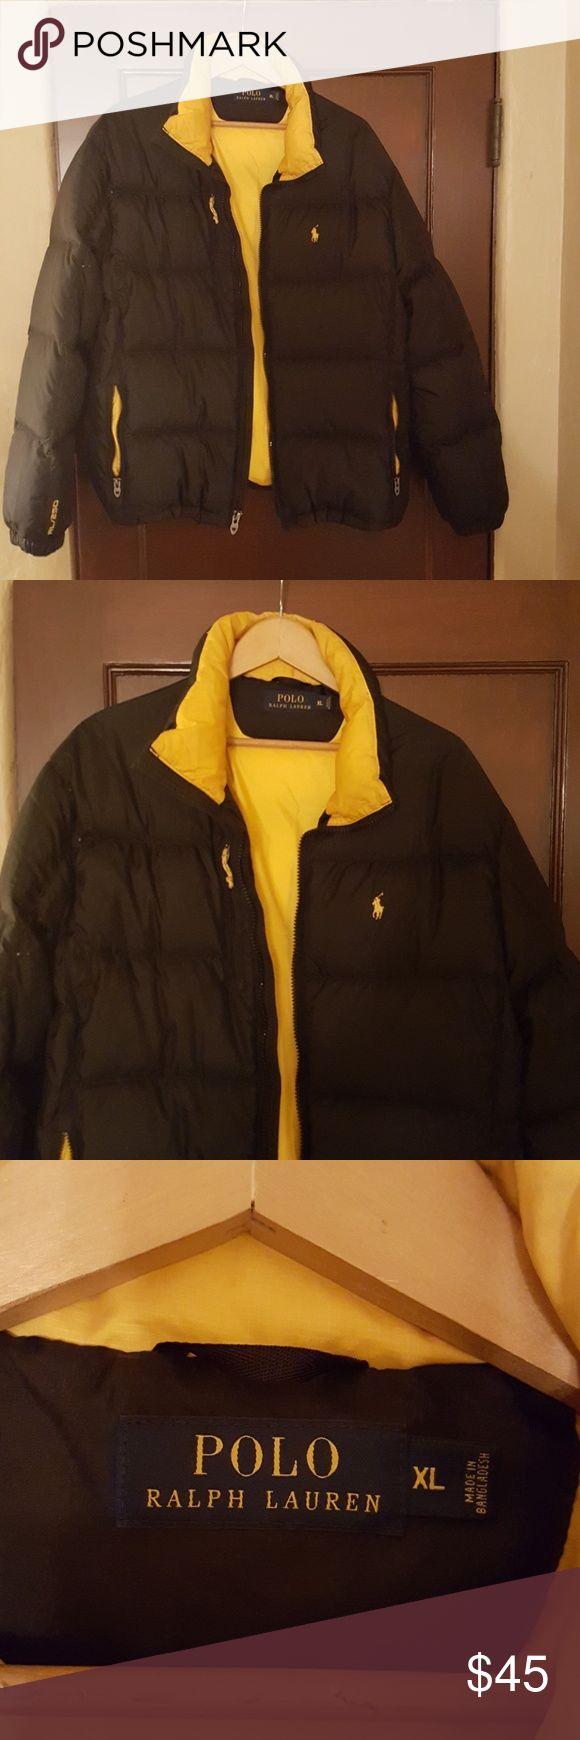 Men's Ralph Lauren/Polo Jacket Black down jacket with gold trim Polo by Ralph Lauren Jackets & Coats Puffers